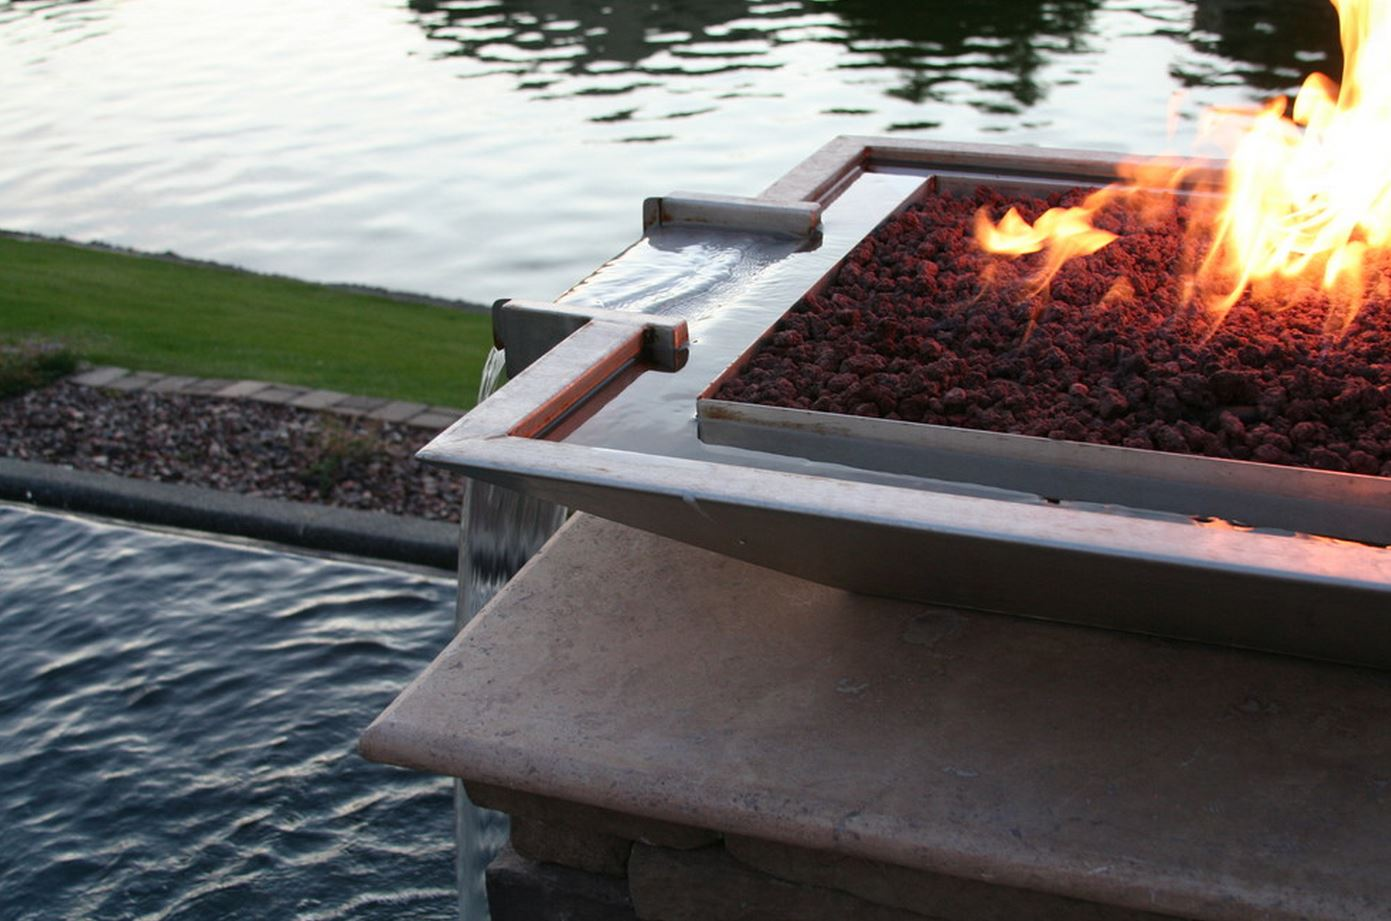 ORIGINAL LIP (MANUAL) - WATER & FIRE BOWLS